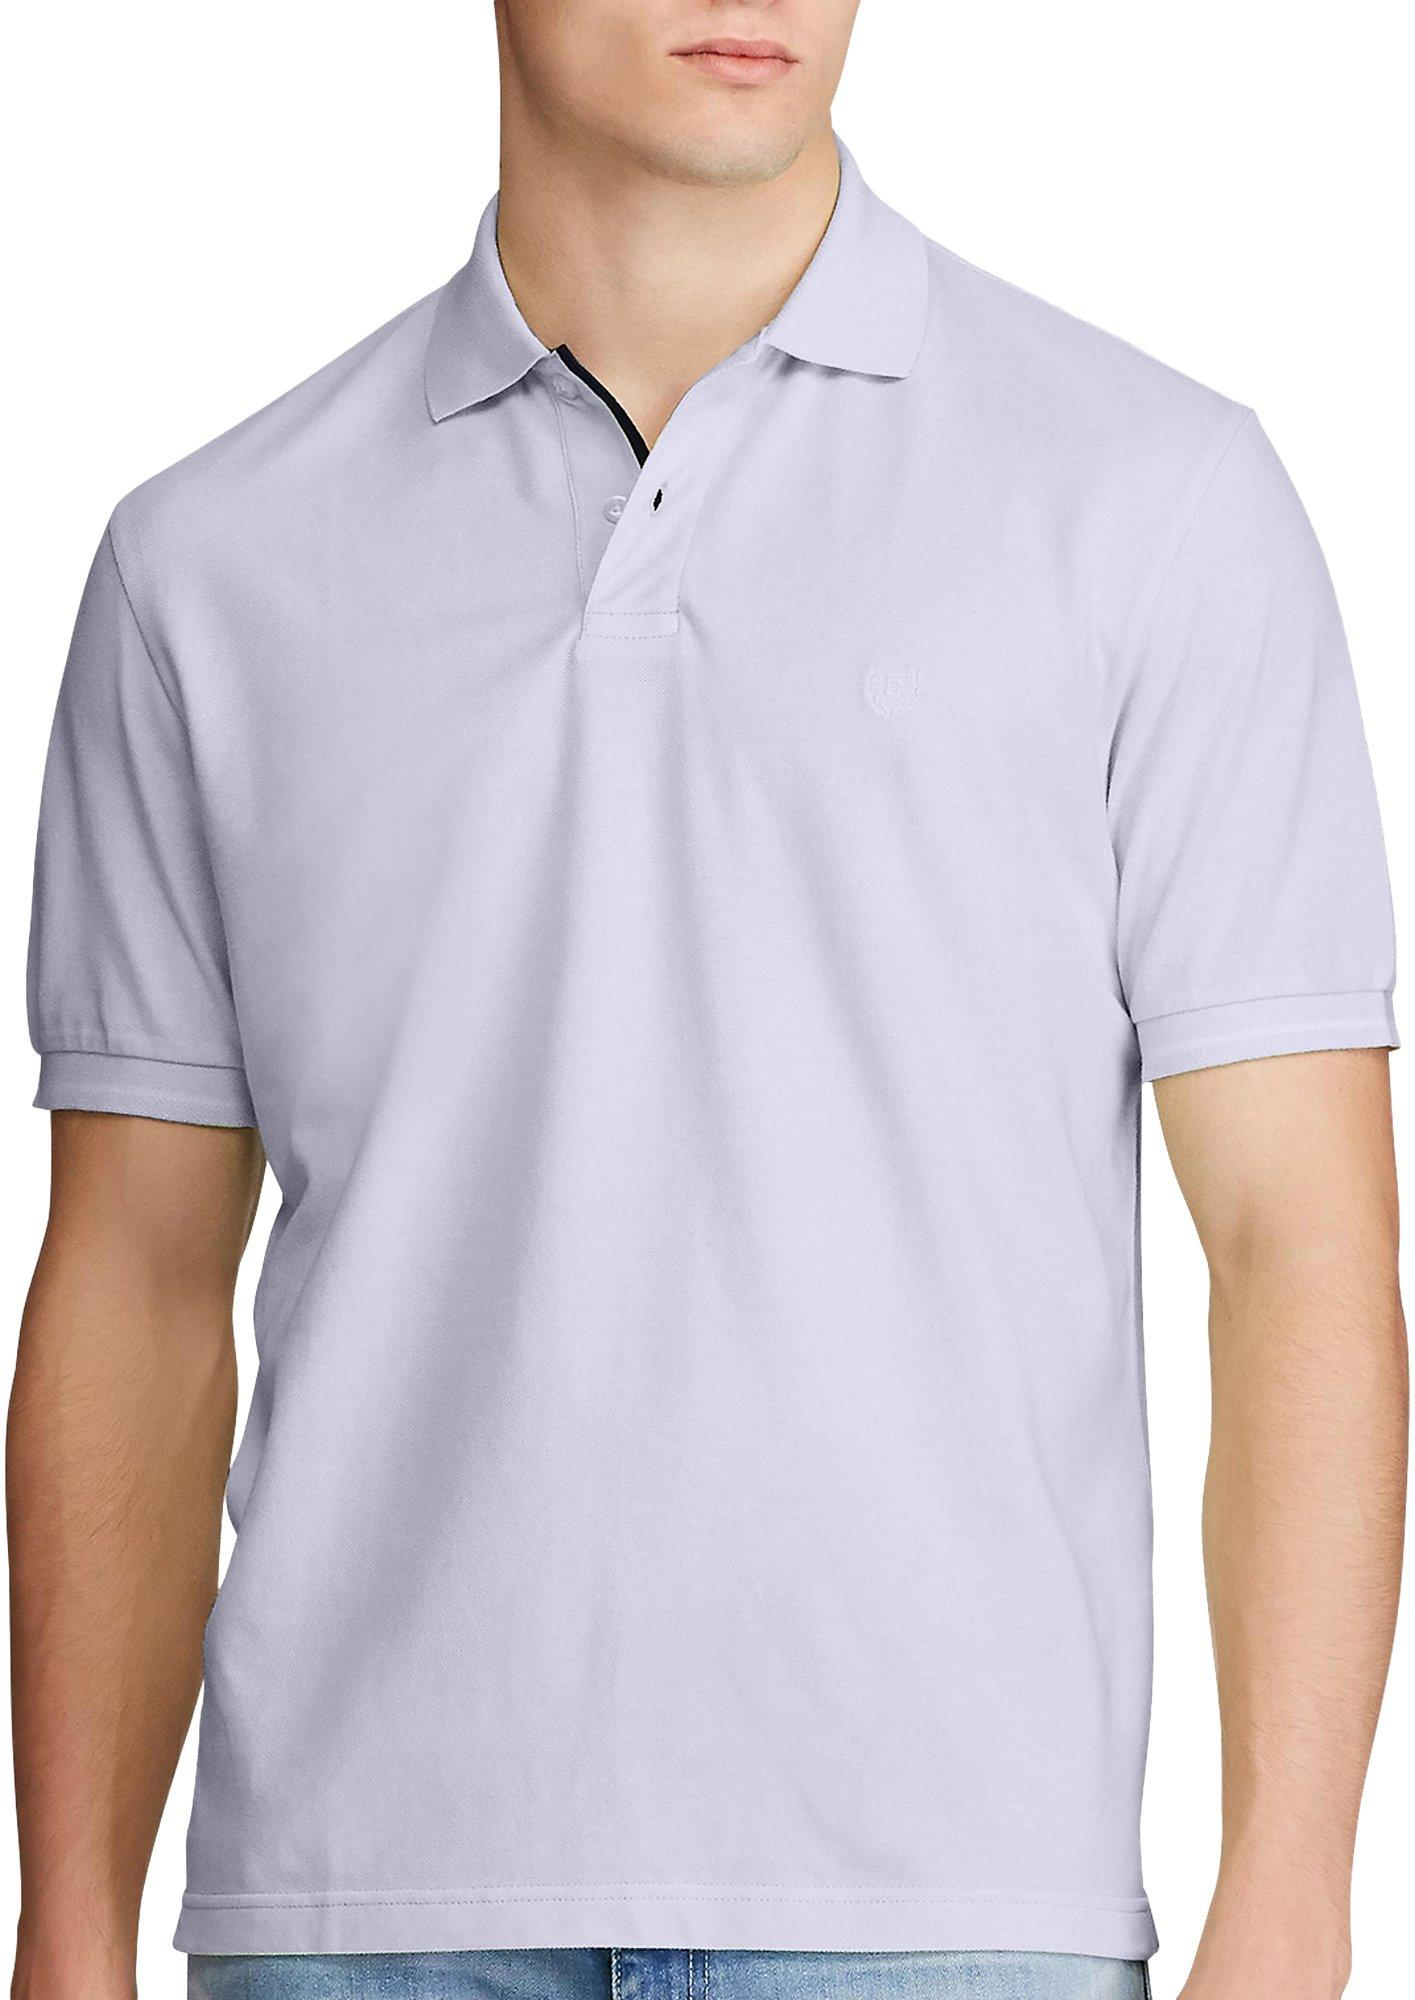 Grey X-Large PGA Tour Mens Long-Sleeve Birdseye Rugby Polo Shirt